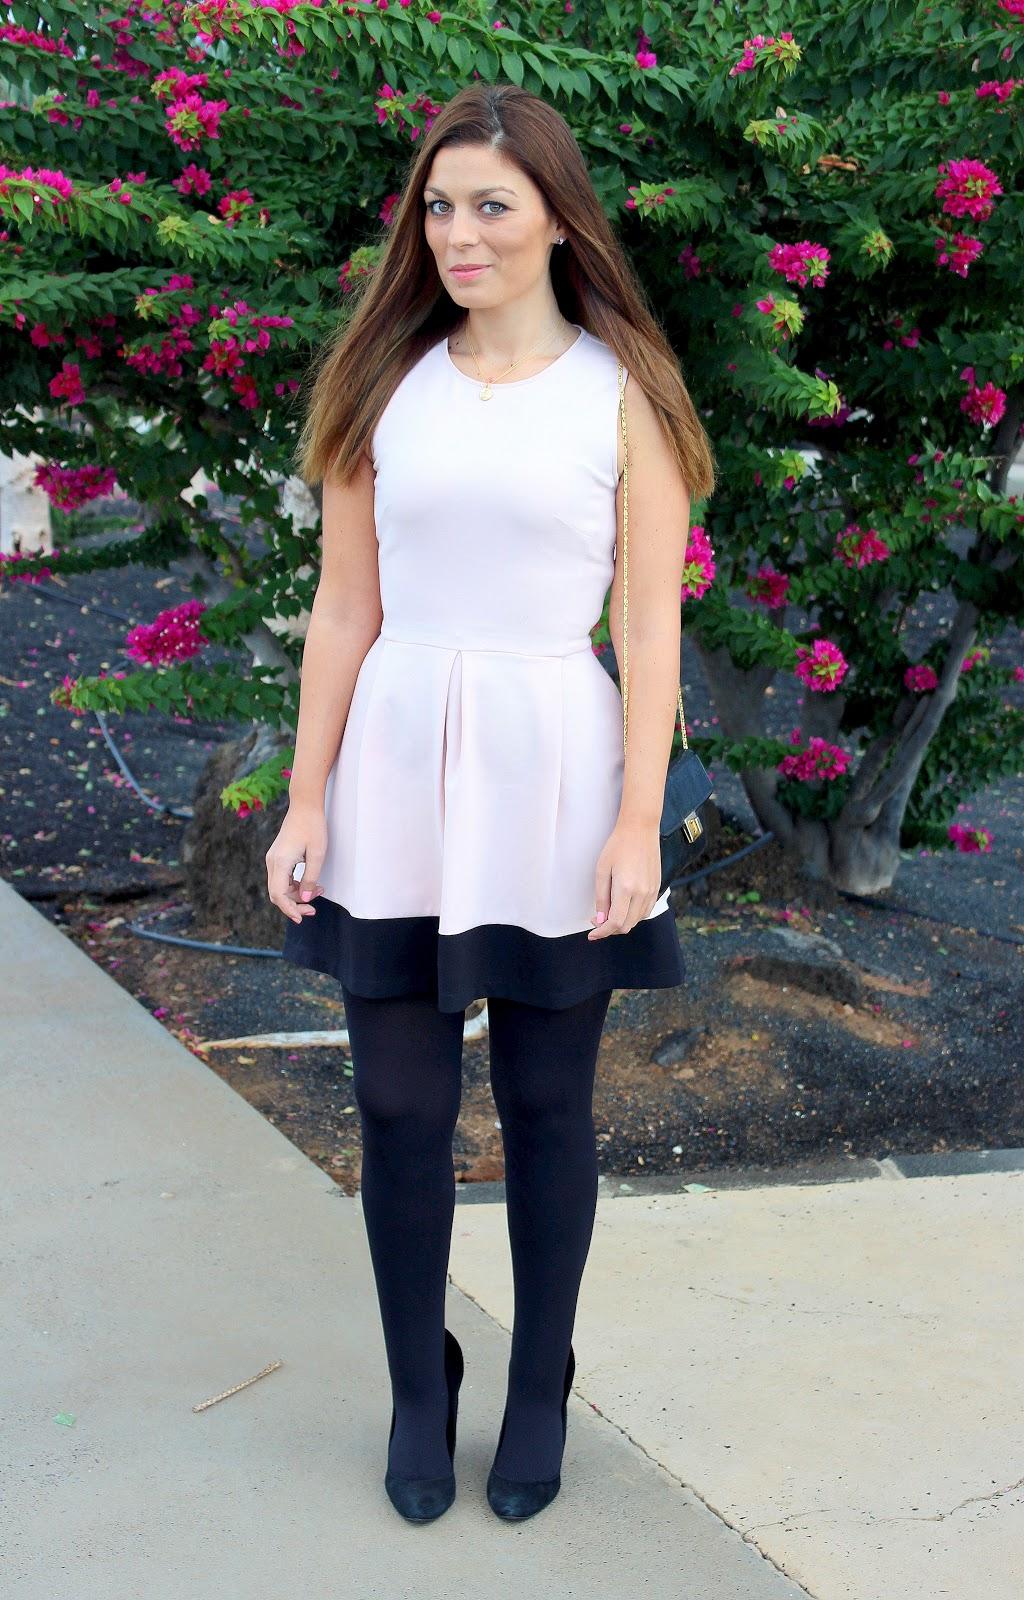 Pink_&_Black_Dress_The_Pink_Graff_04